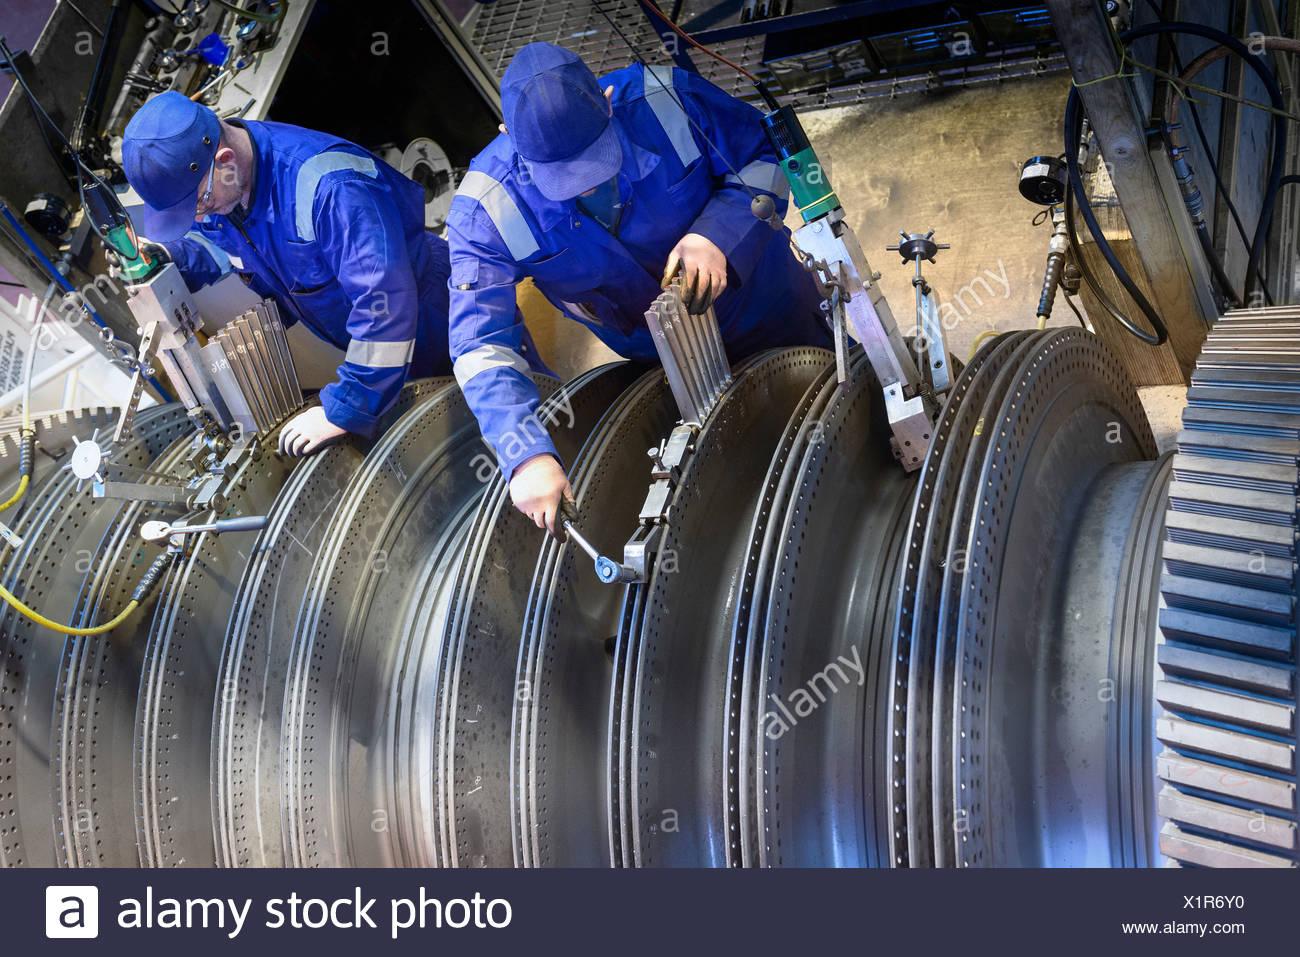 Engineers fitting blades to steam turbine in turbine repair bay - Stock Image